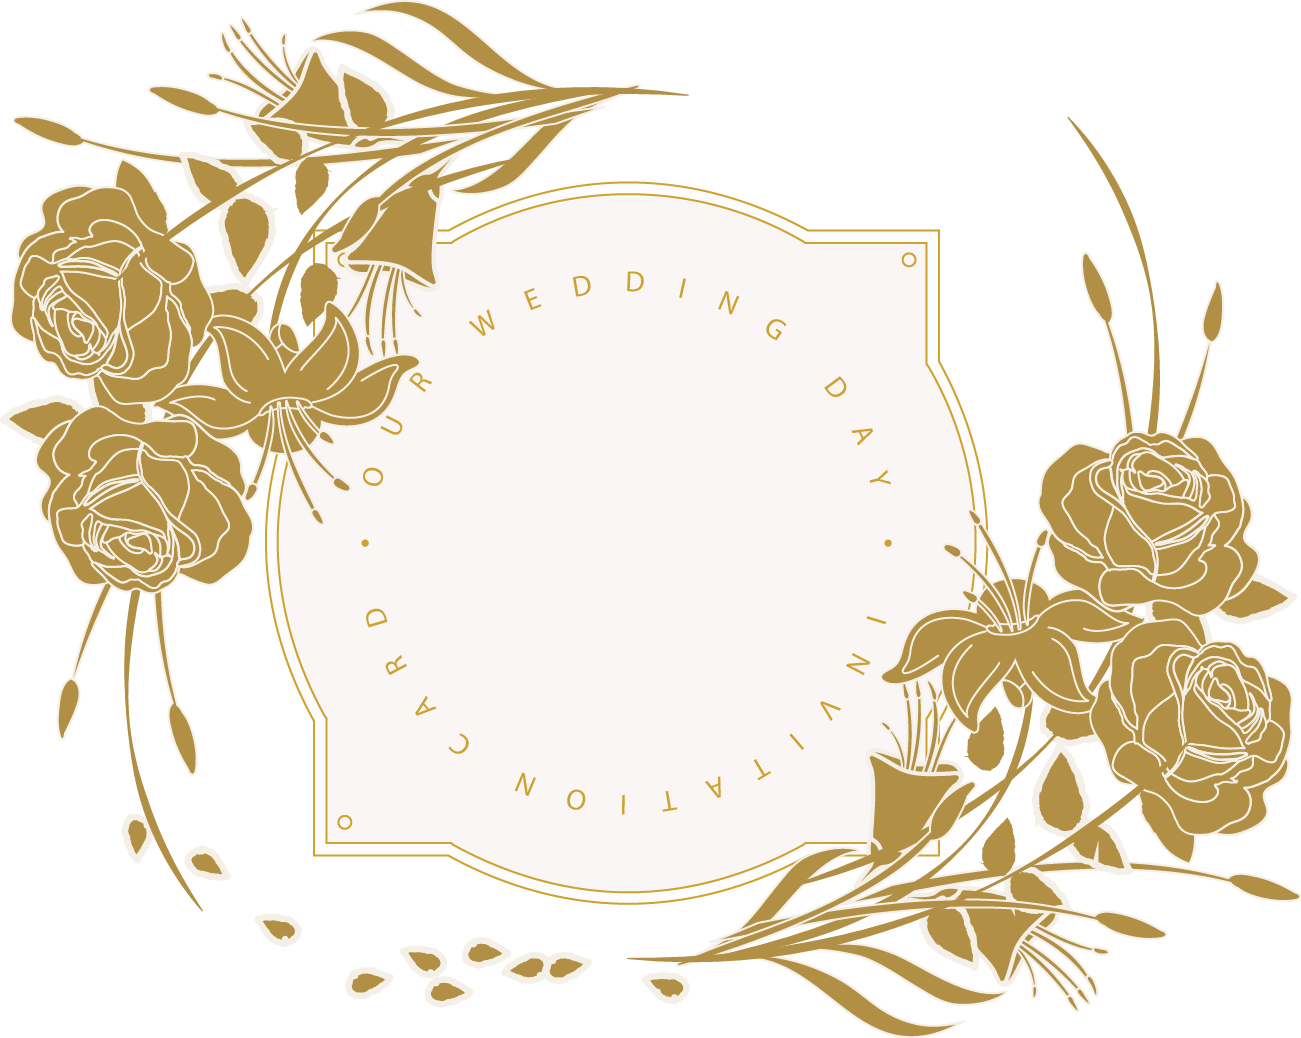 Invitation floral design card. Engagement clipart wedding flower